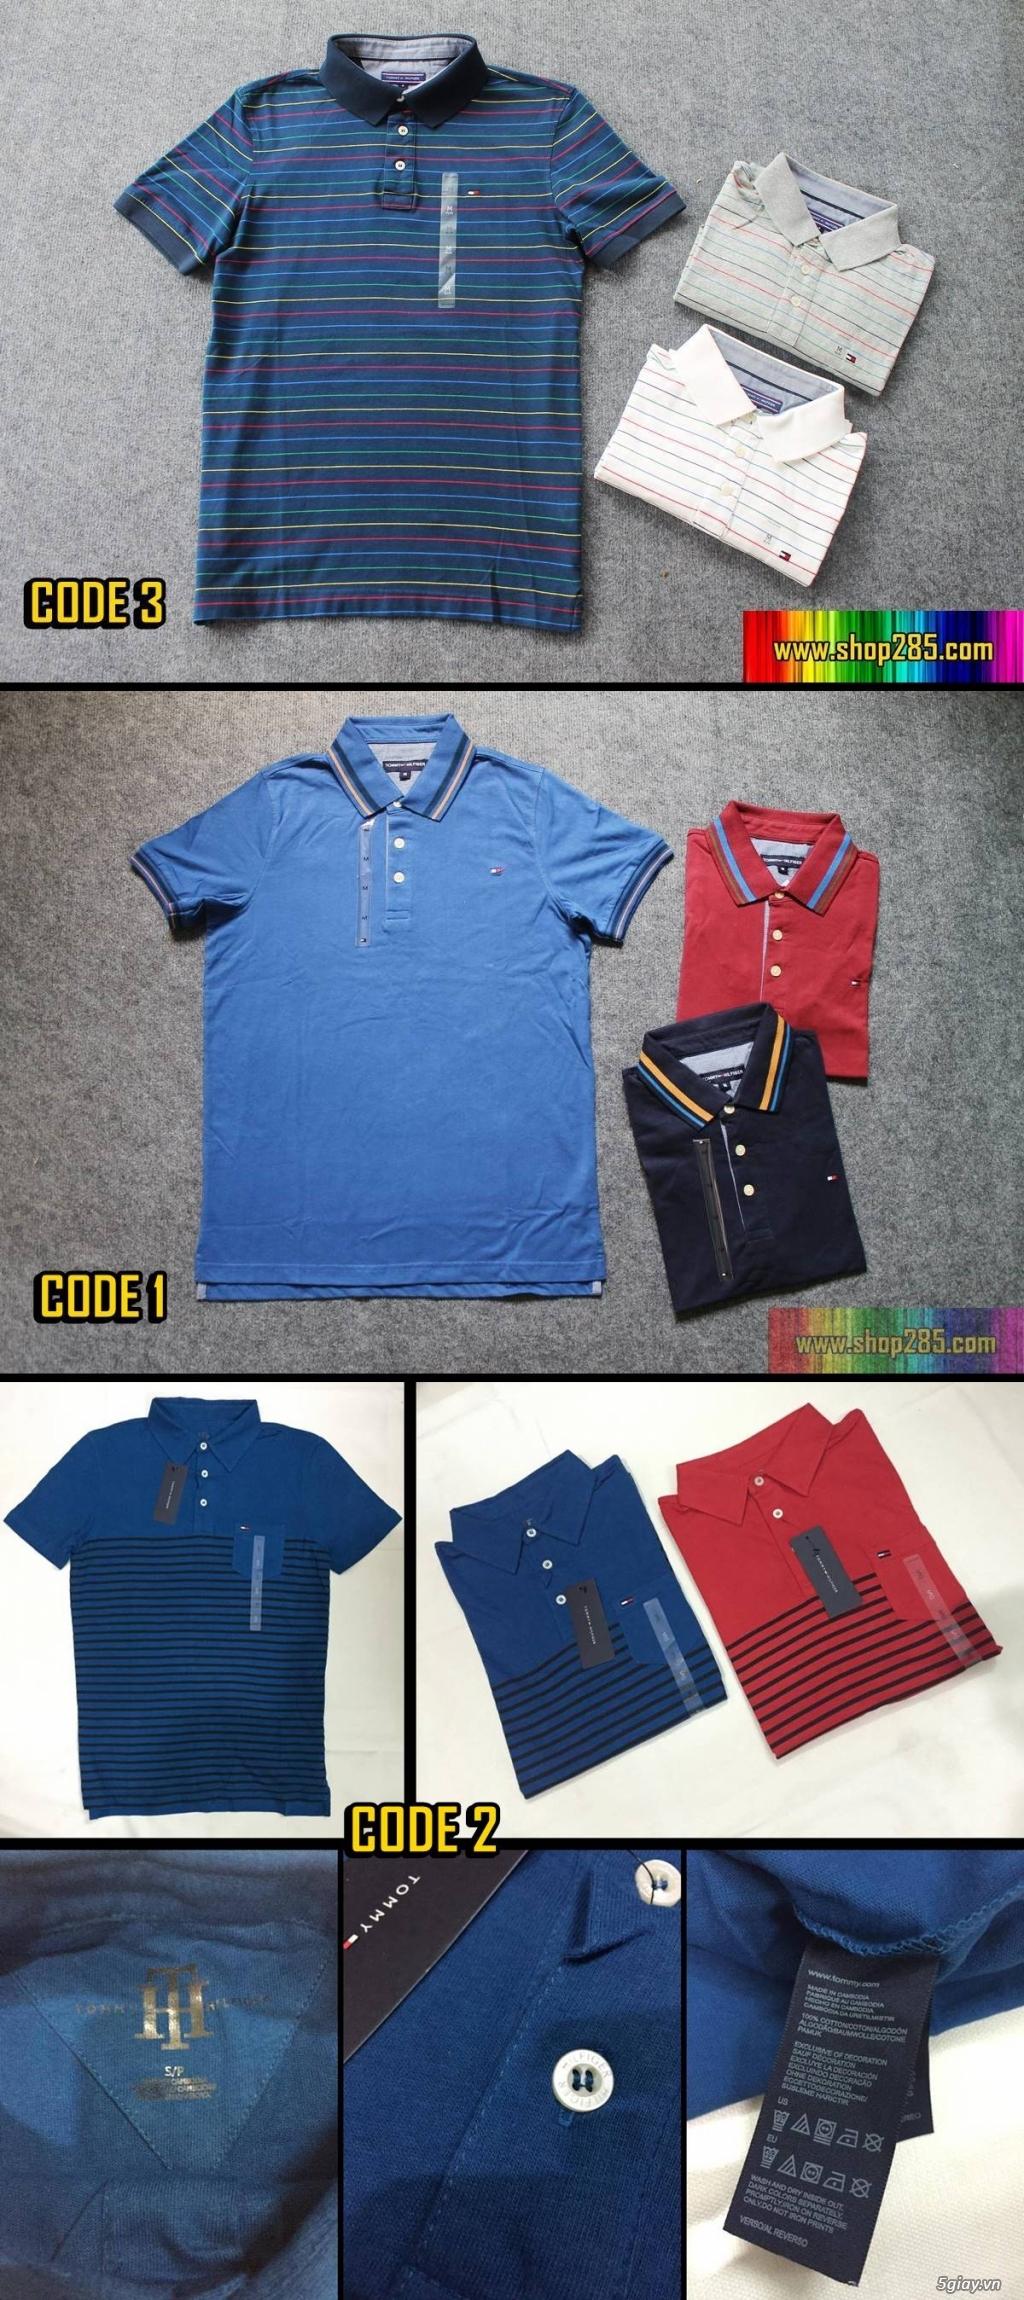 Shop285.com - Shop quần áo : Zara,Jules,Jake*s,,Hollister,Aber,CK,Tommy,Levis - 27